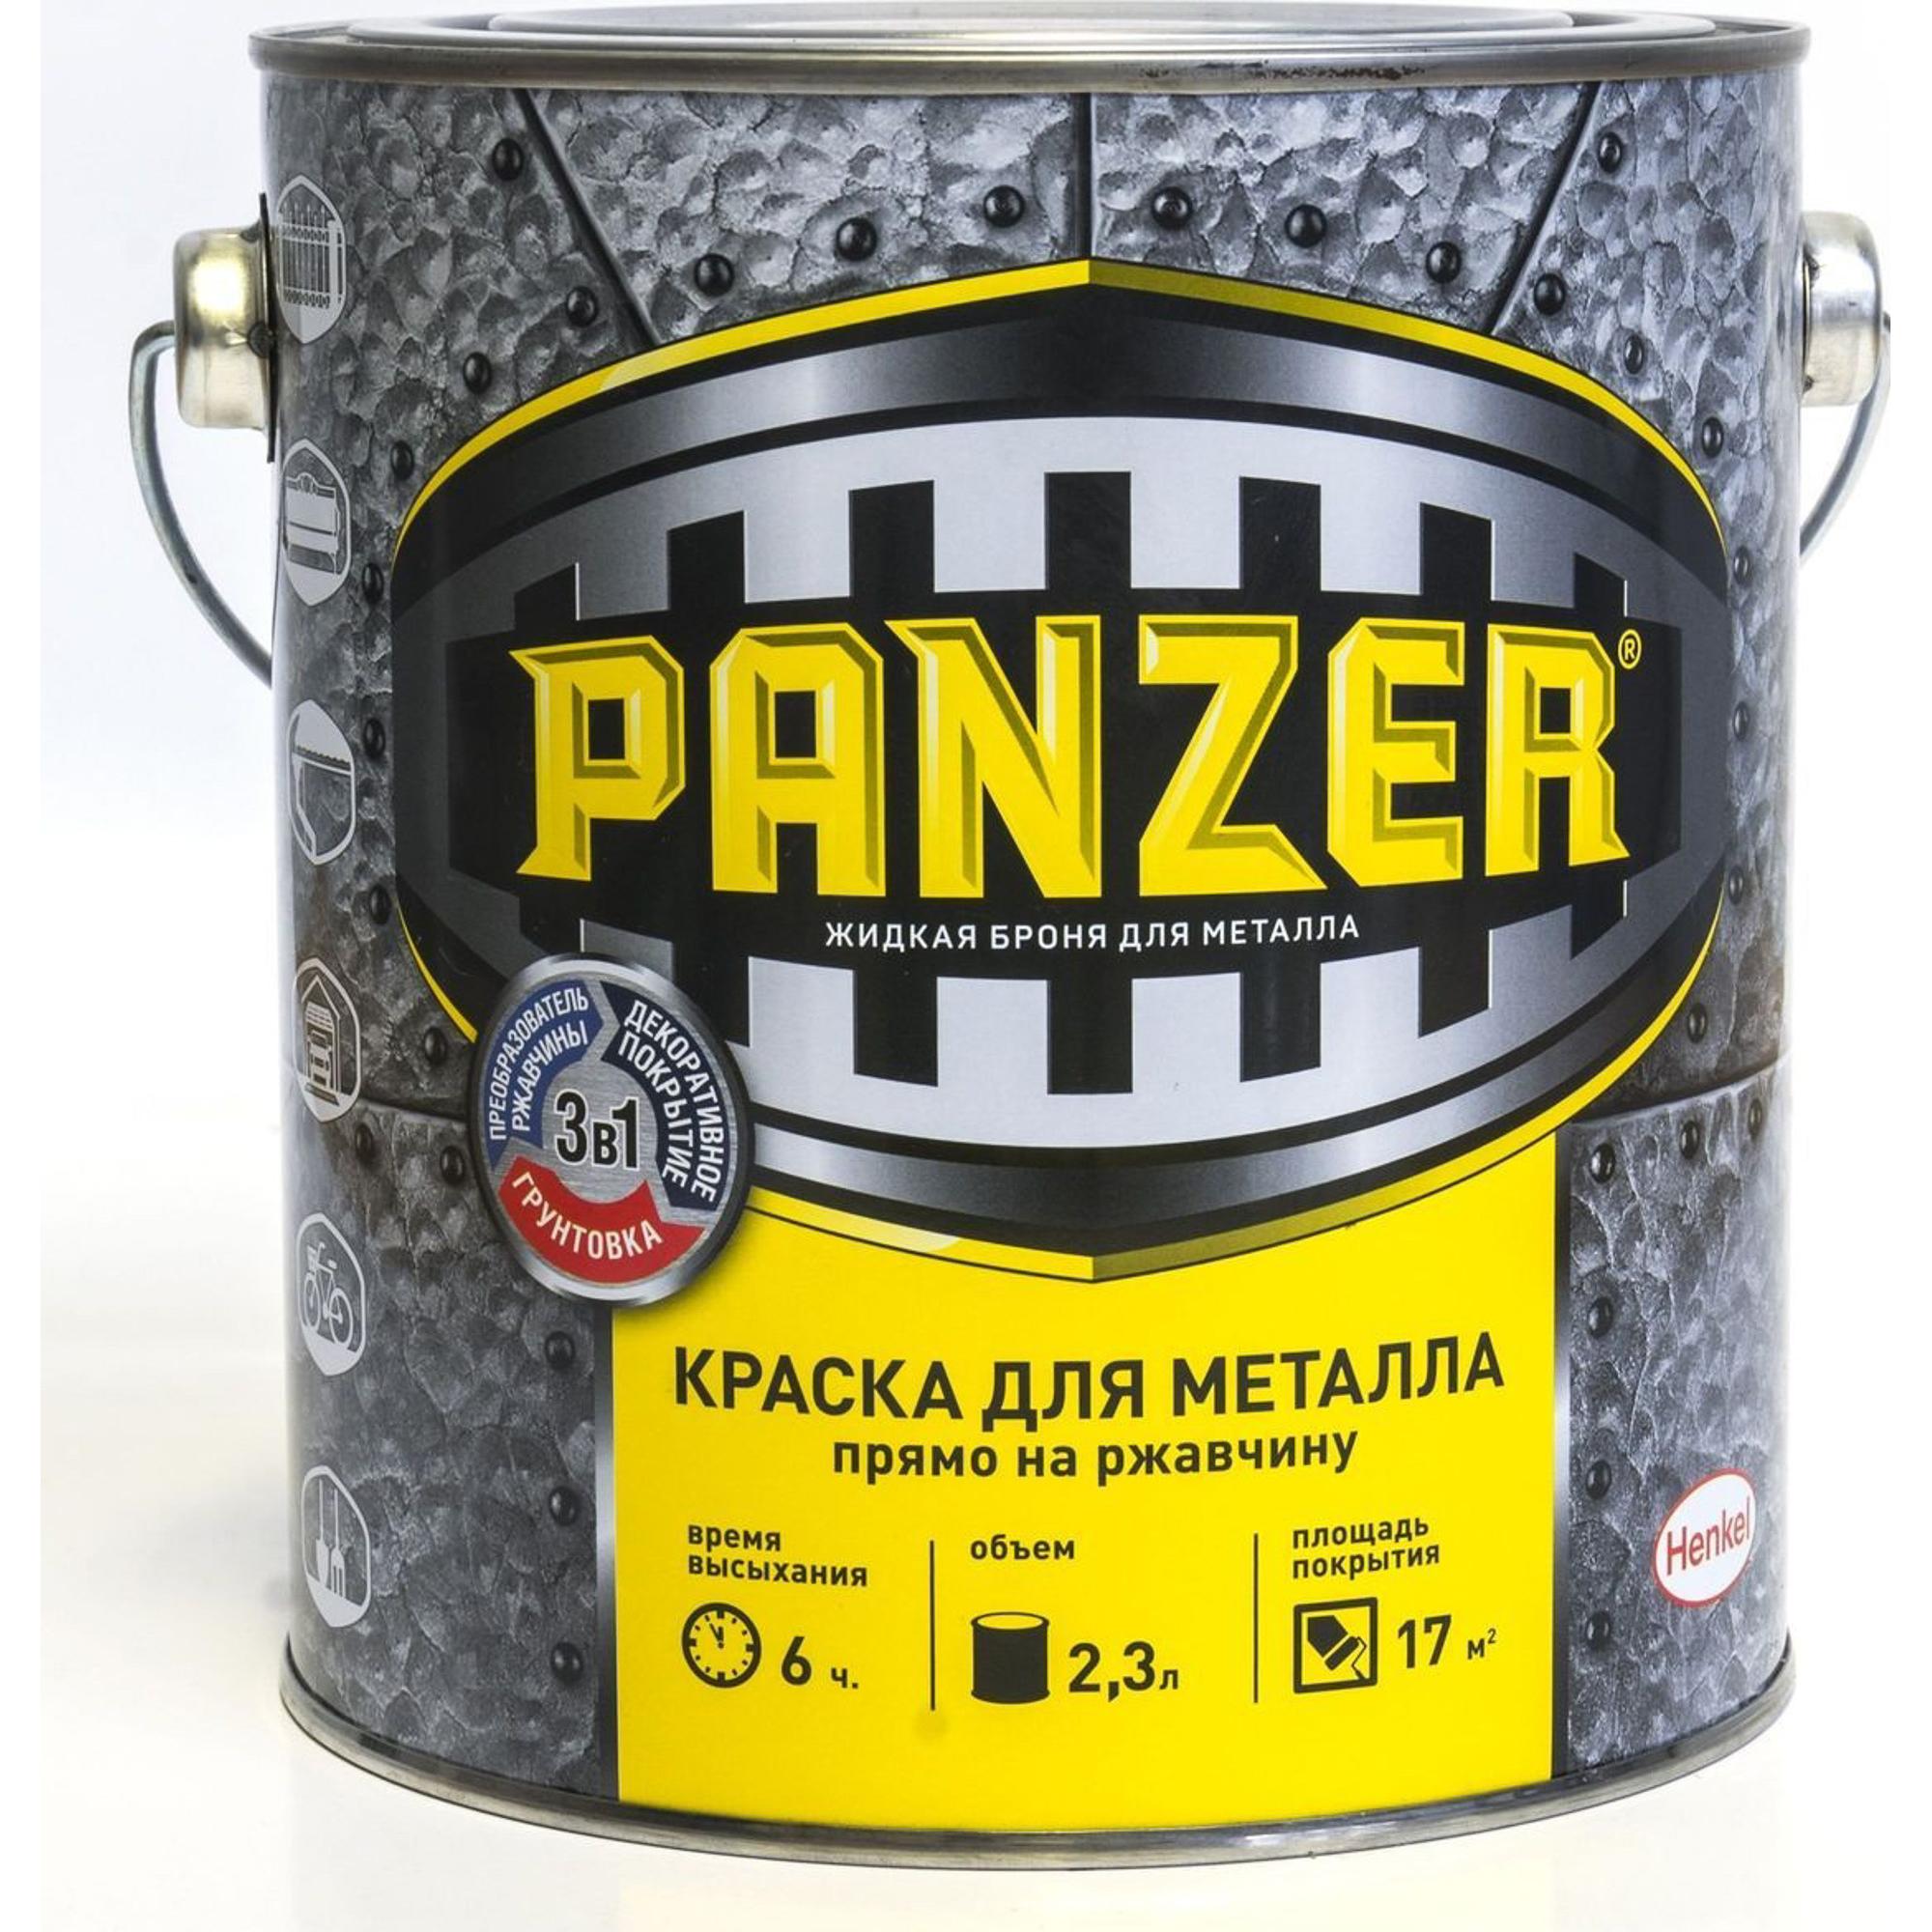 Краска для металла Panzer молотковая золотистая 2.3л